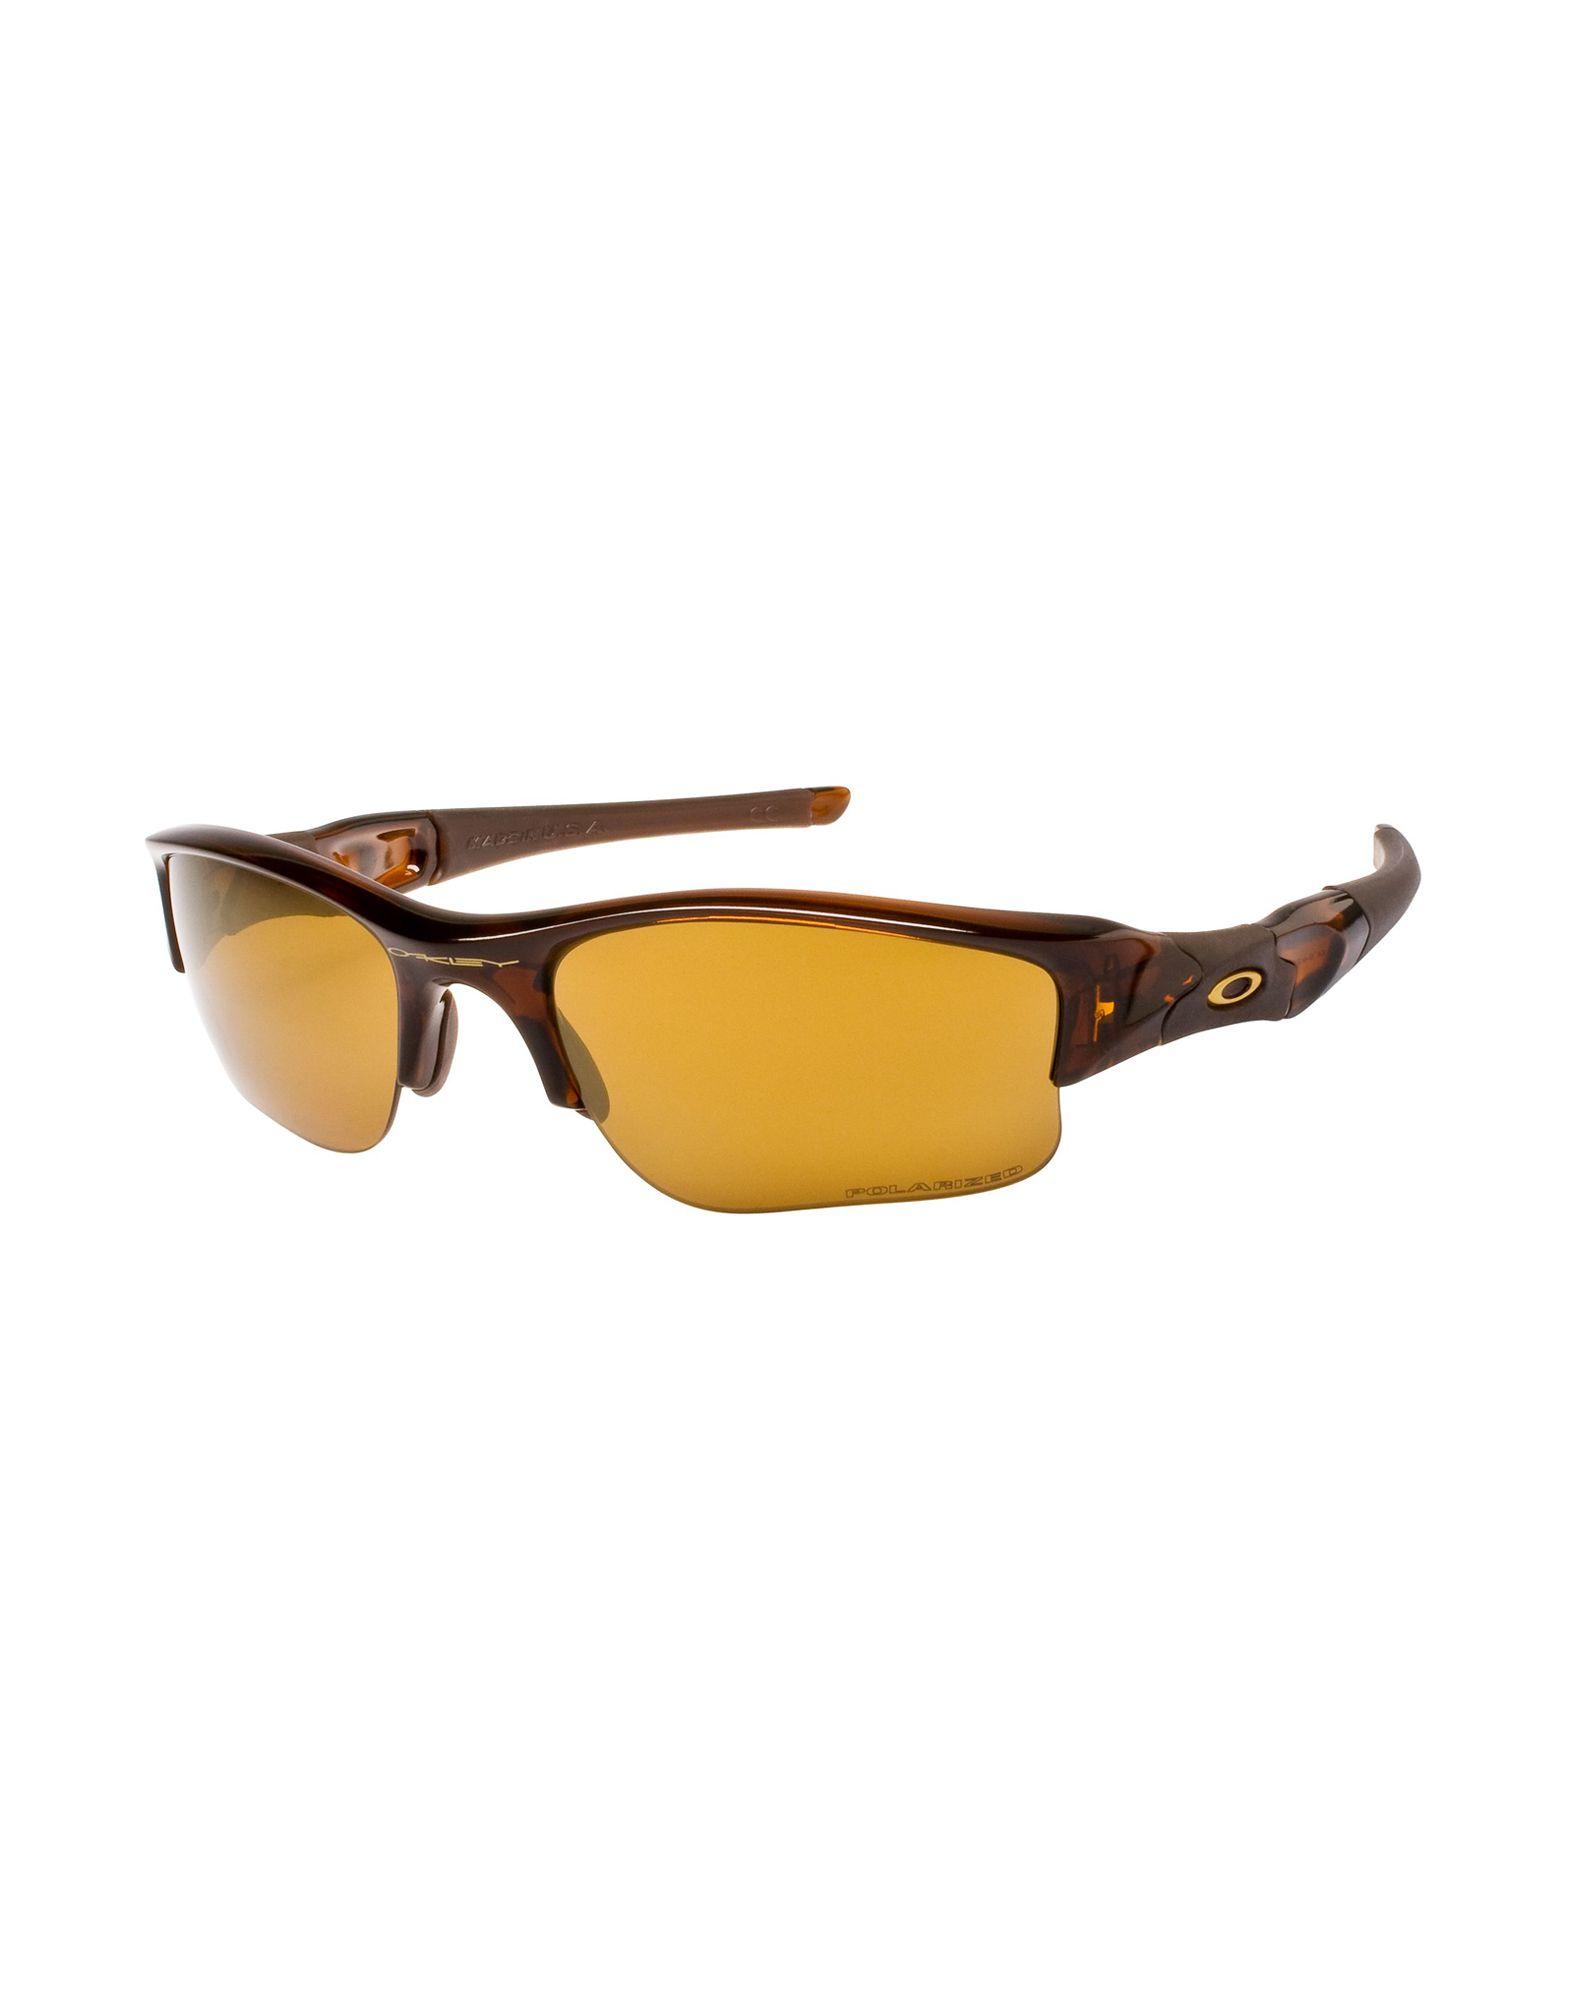 Oakley Sunglasses in Brown for Men